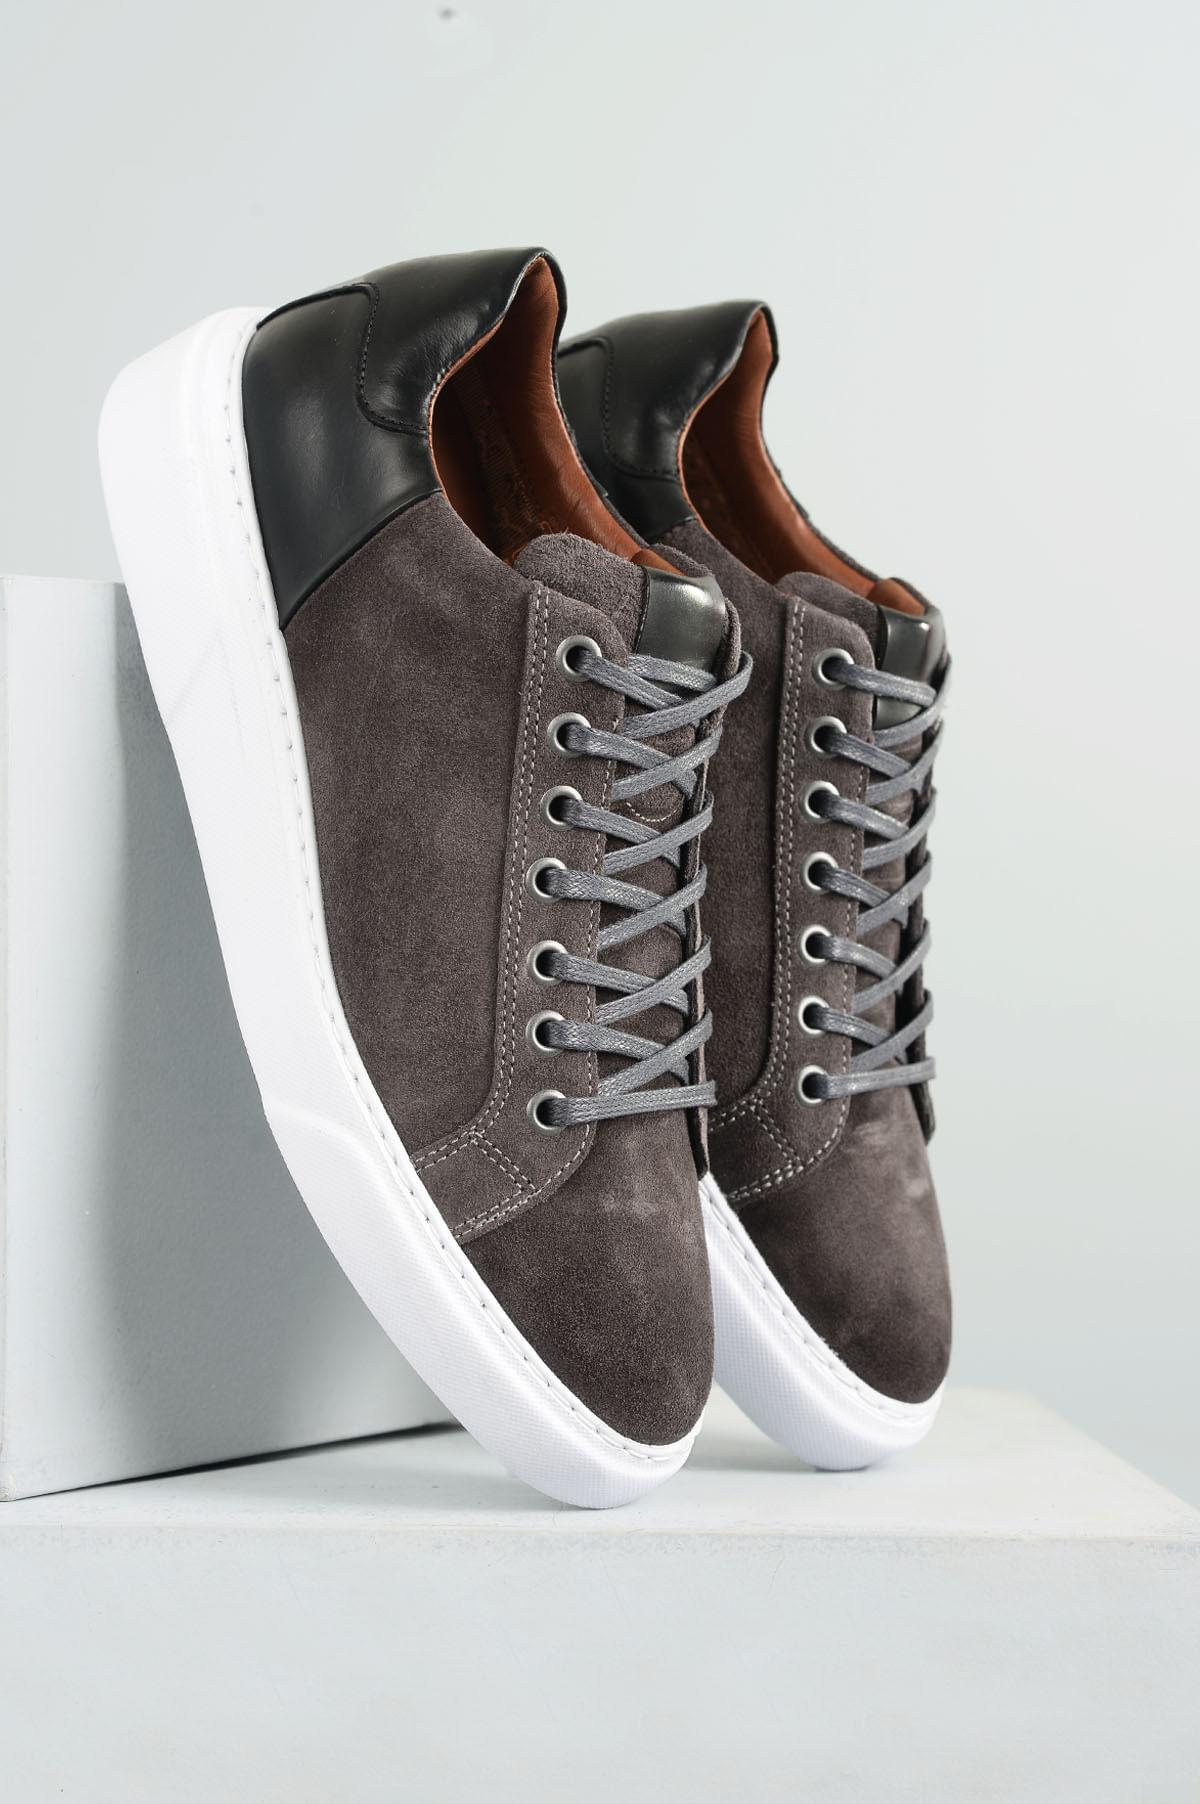 9babc93cccd Sapatênis Masculino Nilton Mundial CAMURÇA CINZA - Mundial Calçados